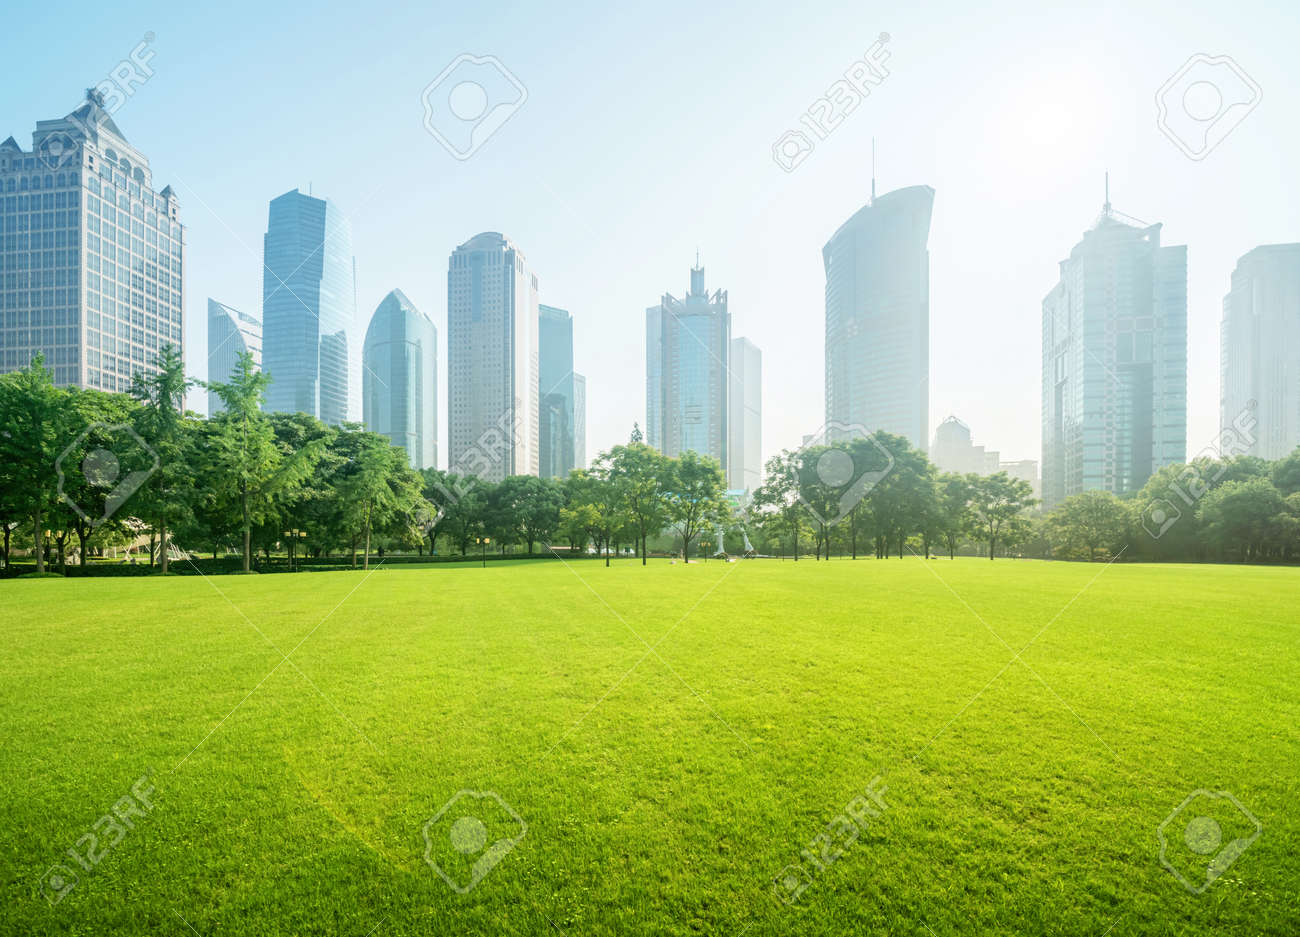 park in lujiazui financial centre, Shanghai, China - 147984455